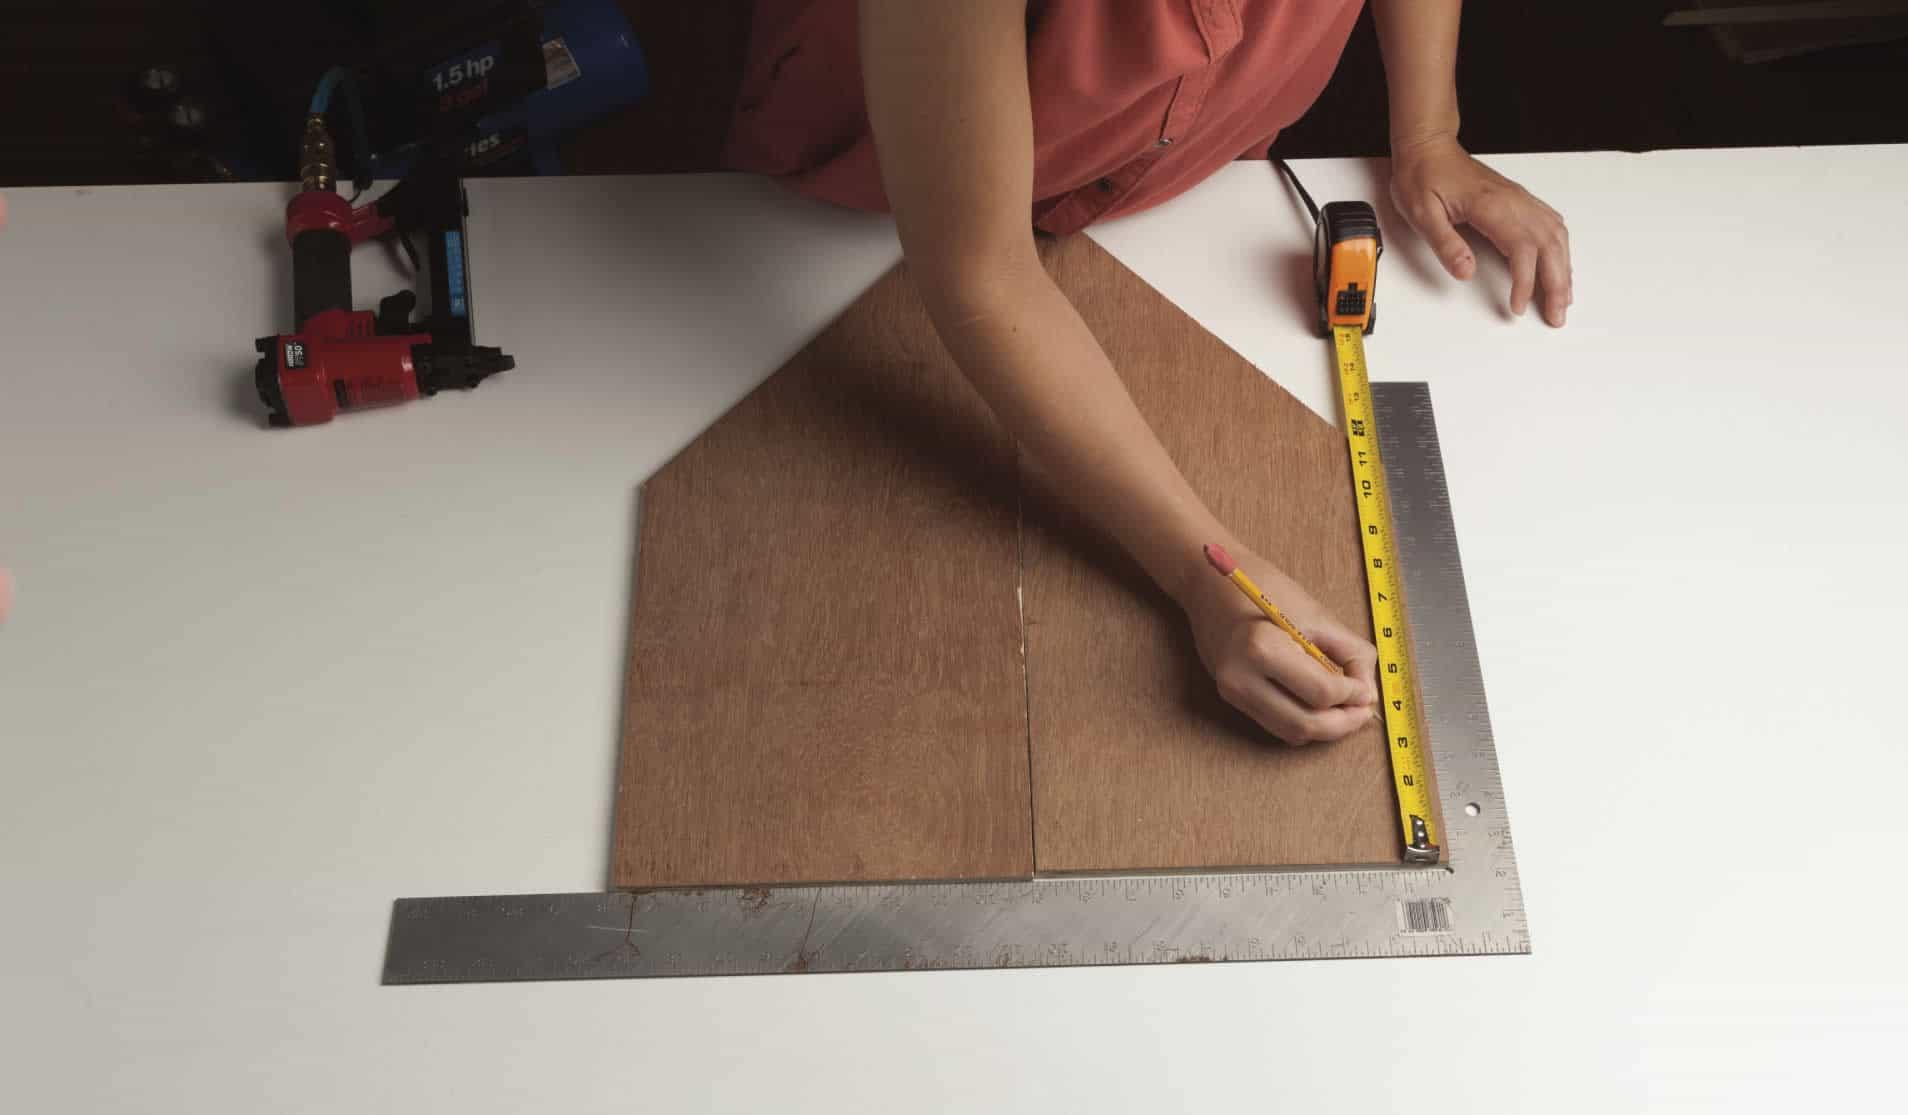 tool-organizer-arrow-project-step1a.jpg